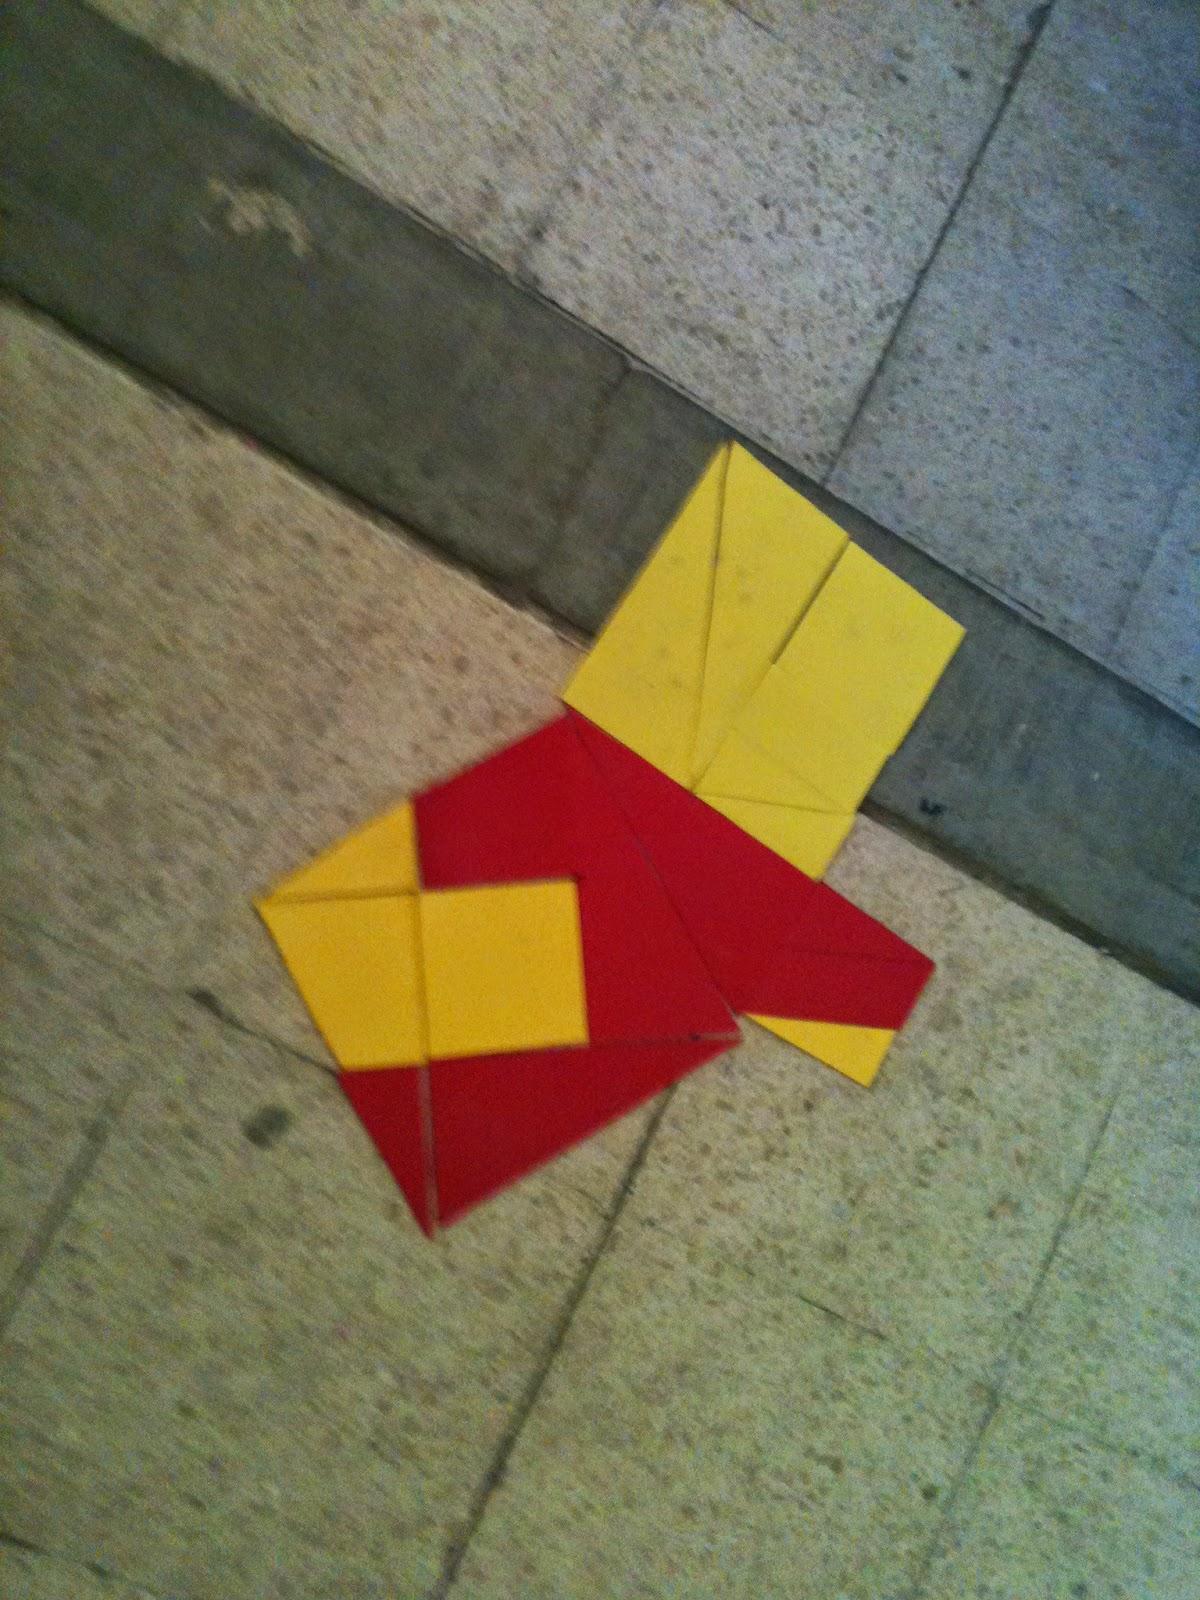 MATEMÁTICAS DE SECUNDARIA: Demostración Teorema Pitagoras